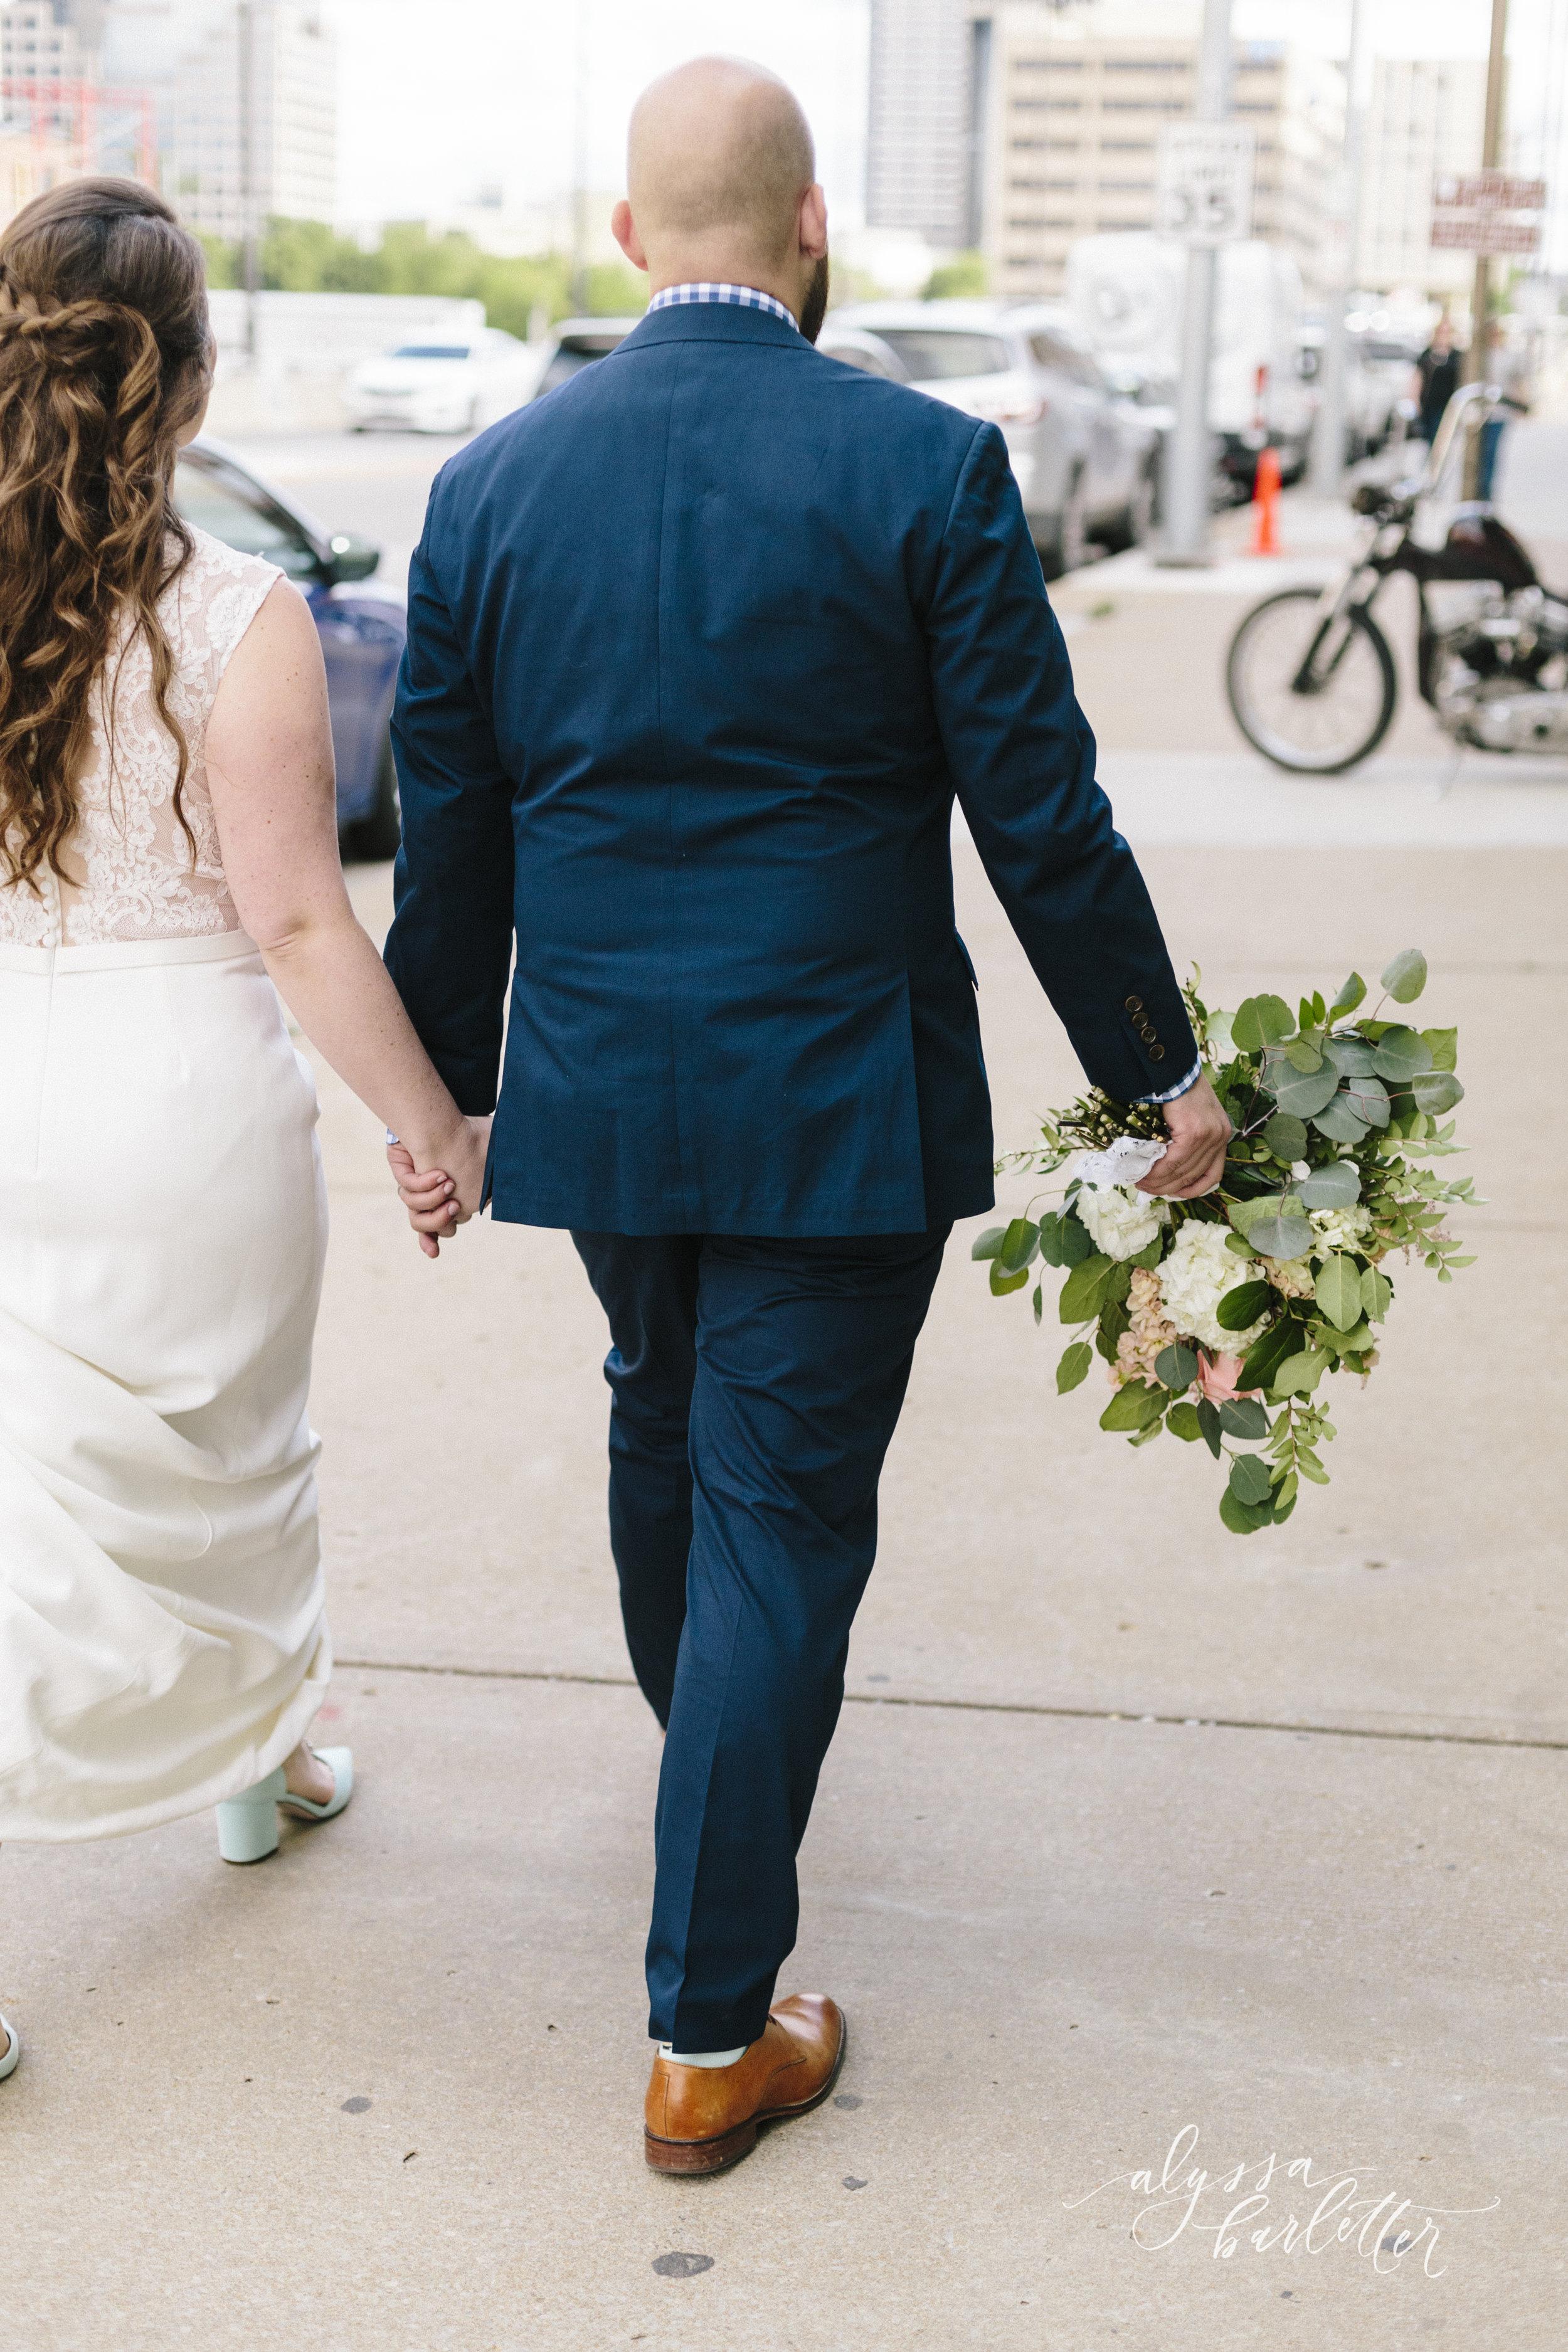 alyssa barletter photography kansas city wedding 2016 main courtney and brian-1-39.jpg